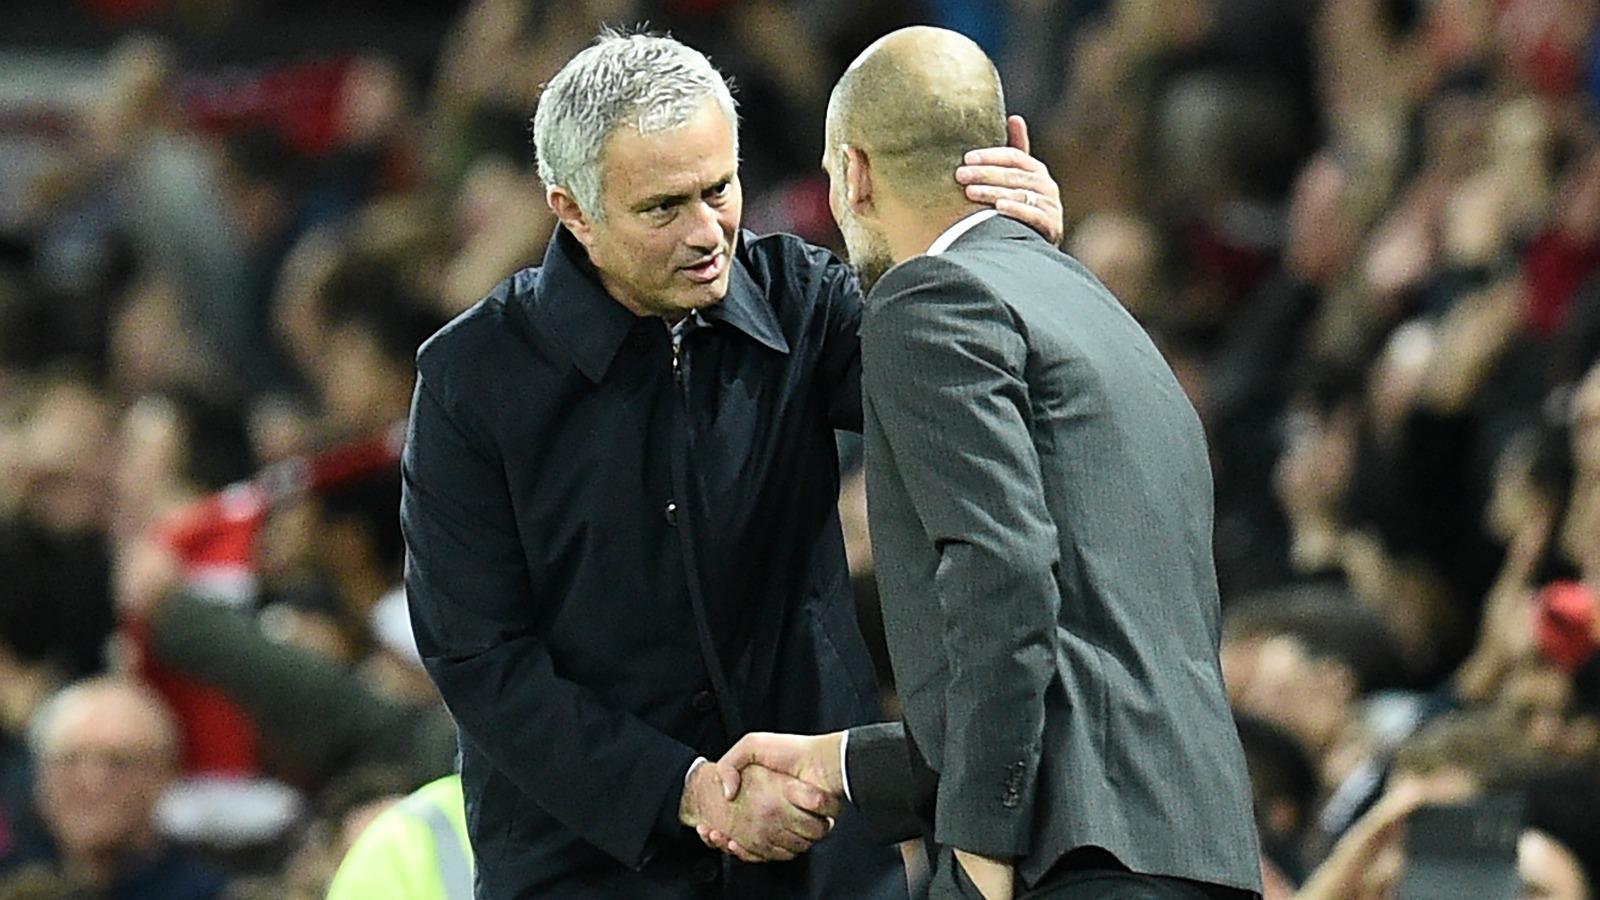 010117-Jose-Mourinho-Pep-Guardiola